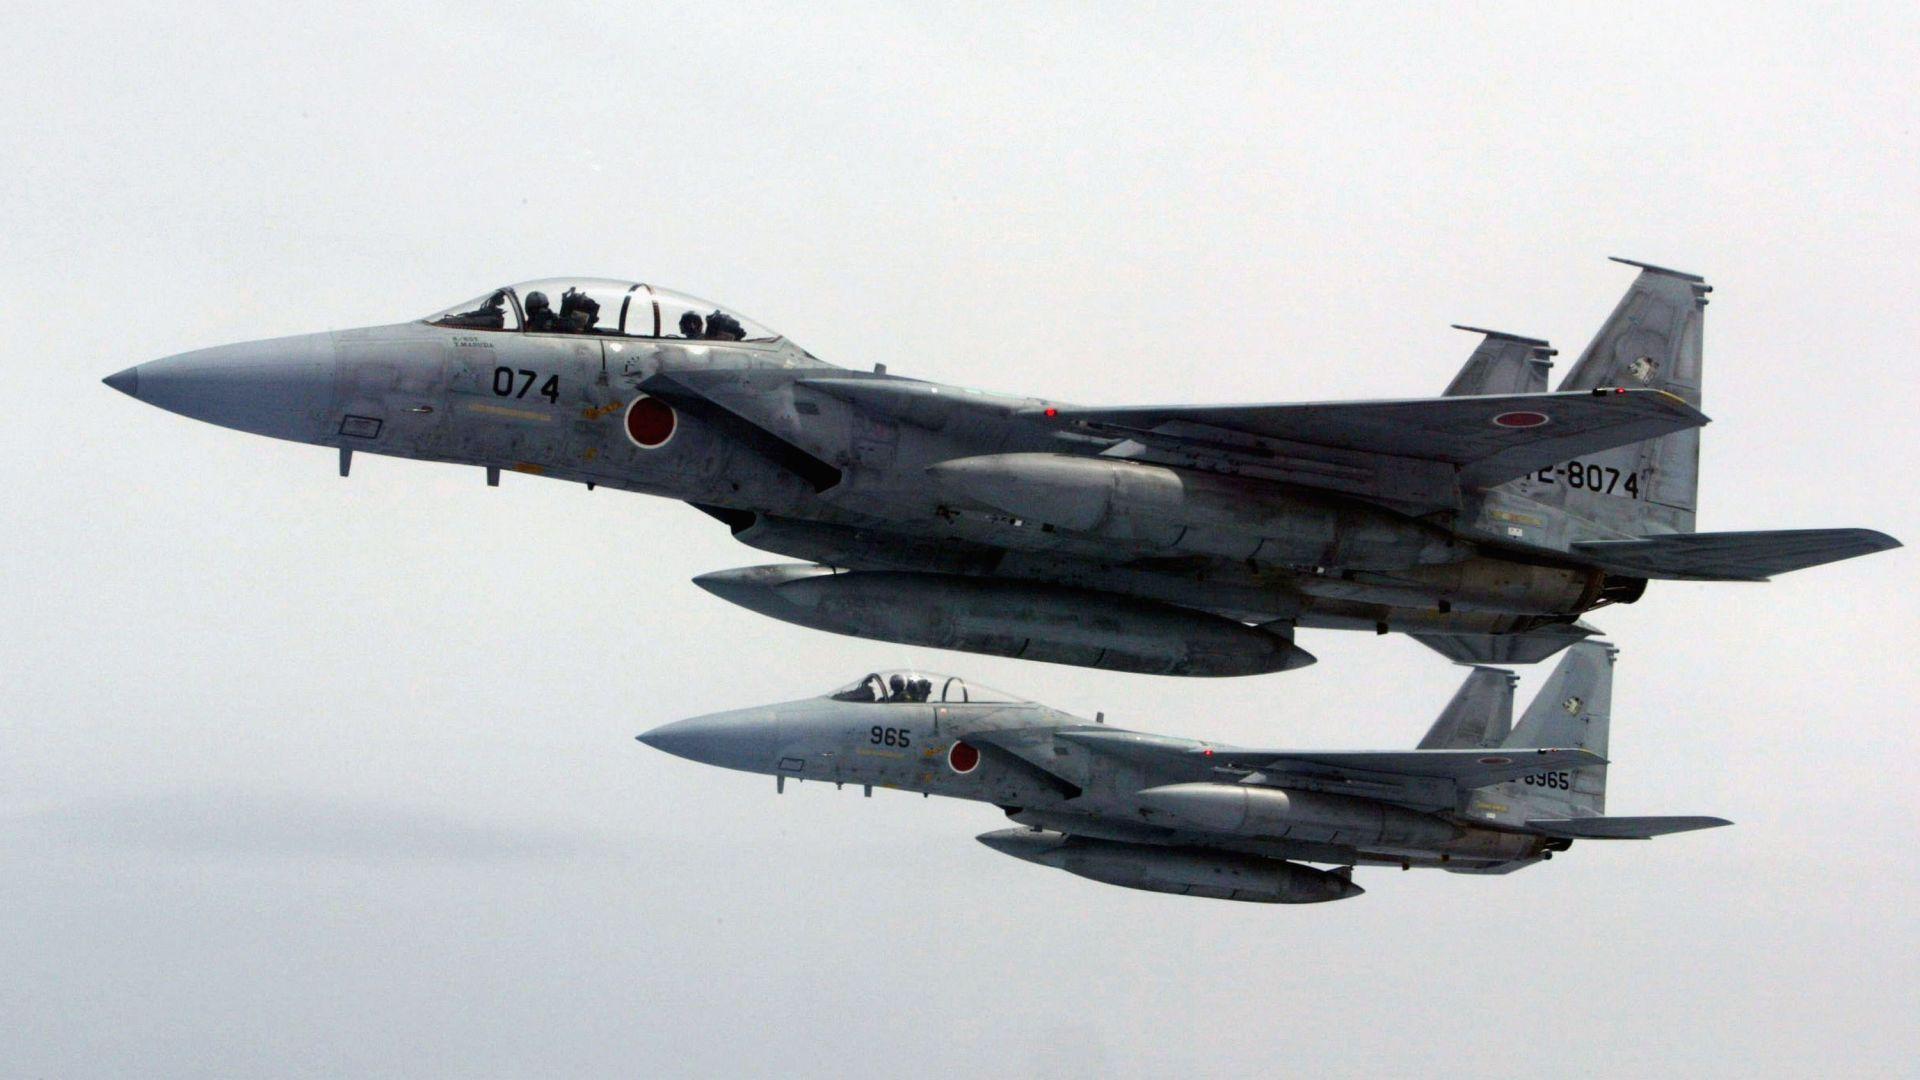 Японски изтребители вдигнати по тревога заради руски бомбардировачи